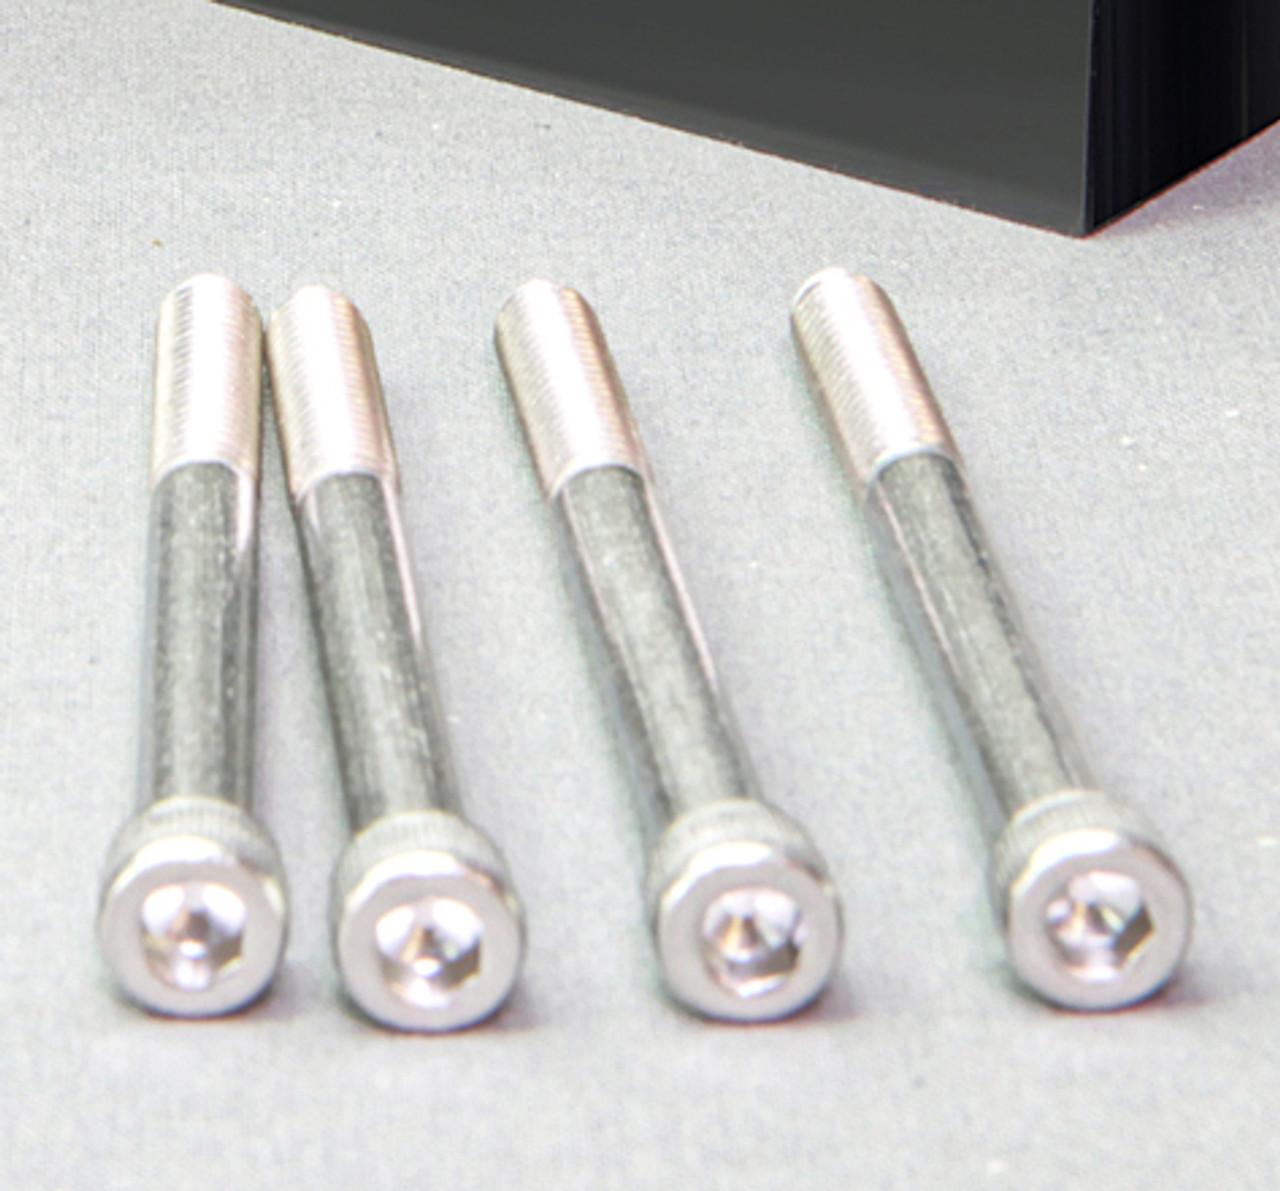 M6 X 80 mm Socket cap head screws